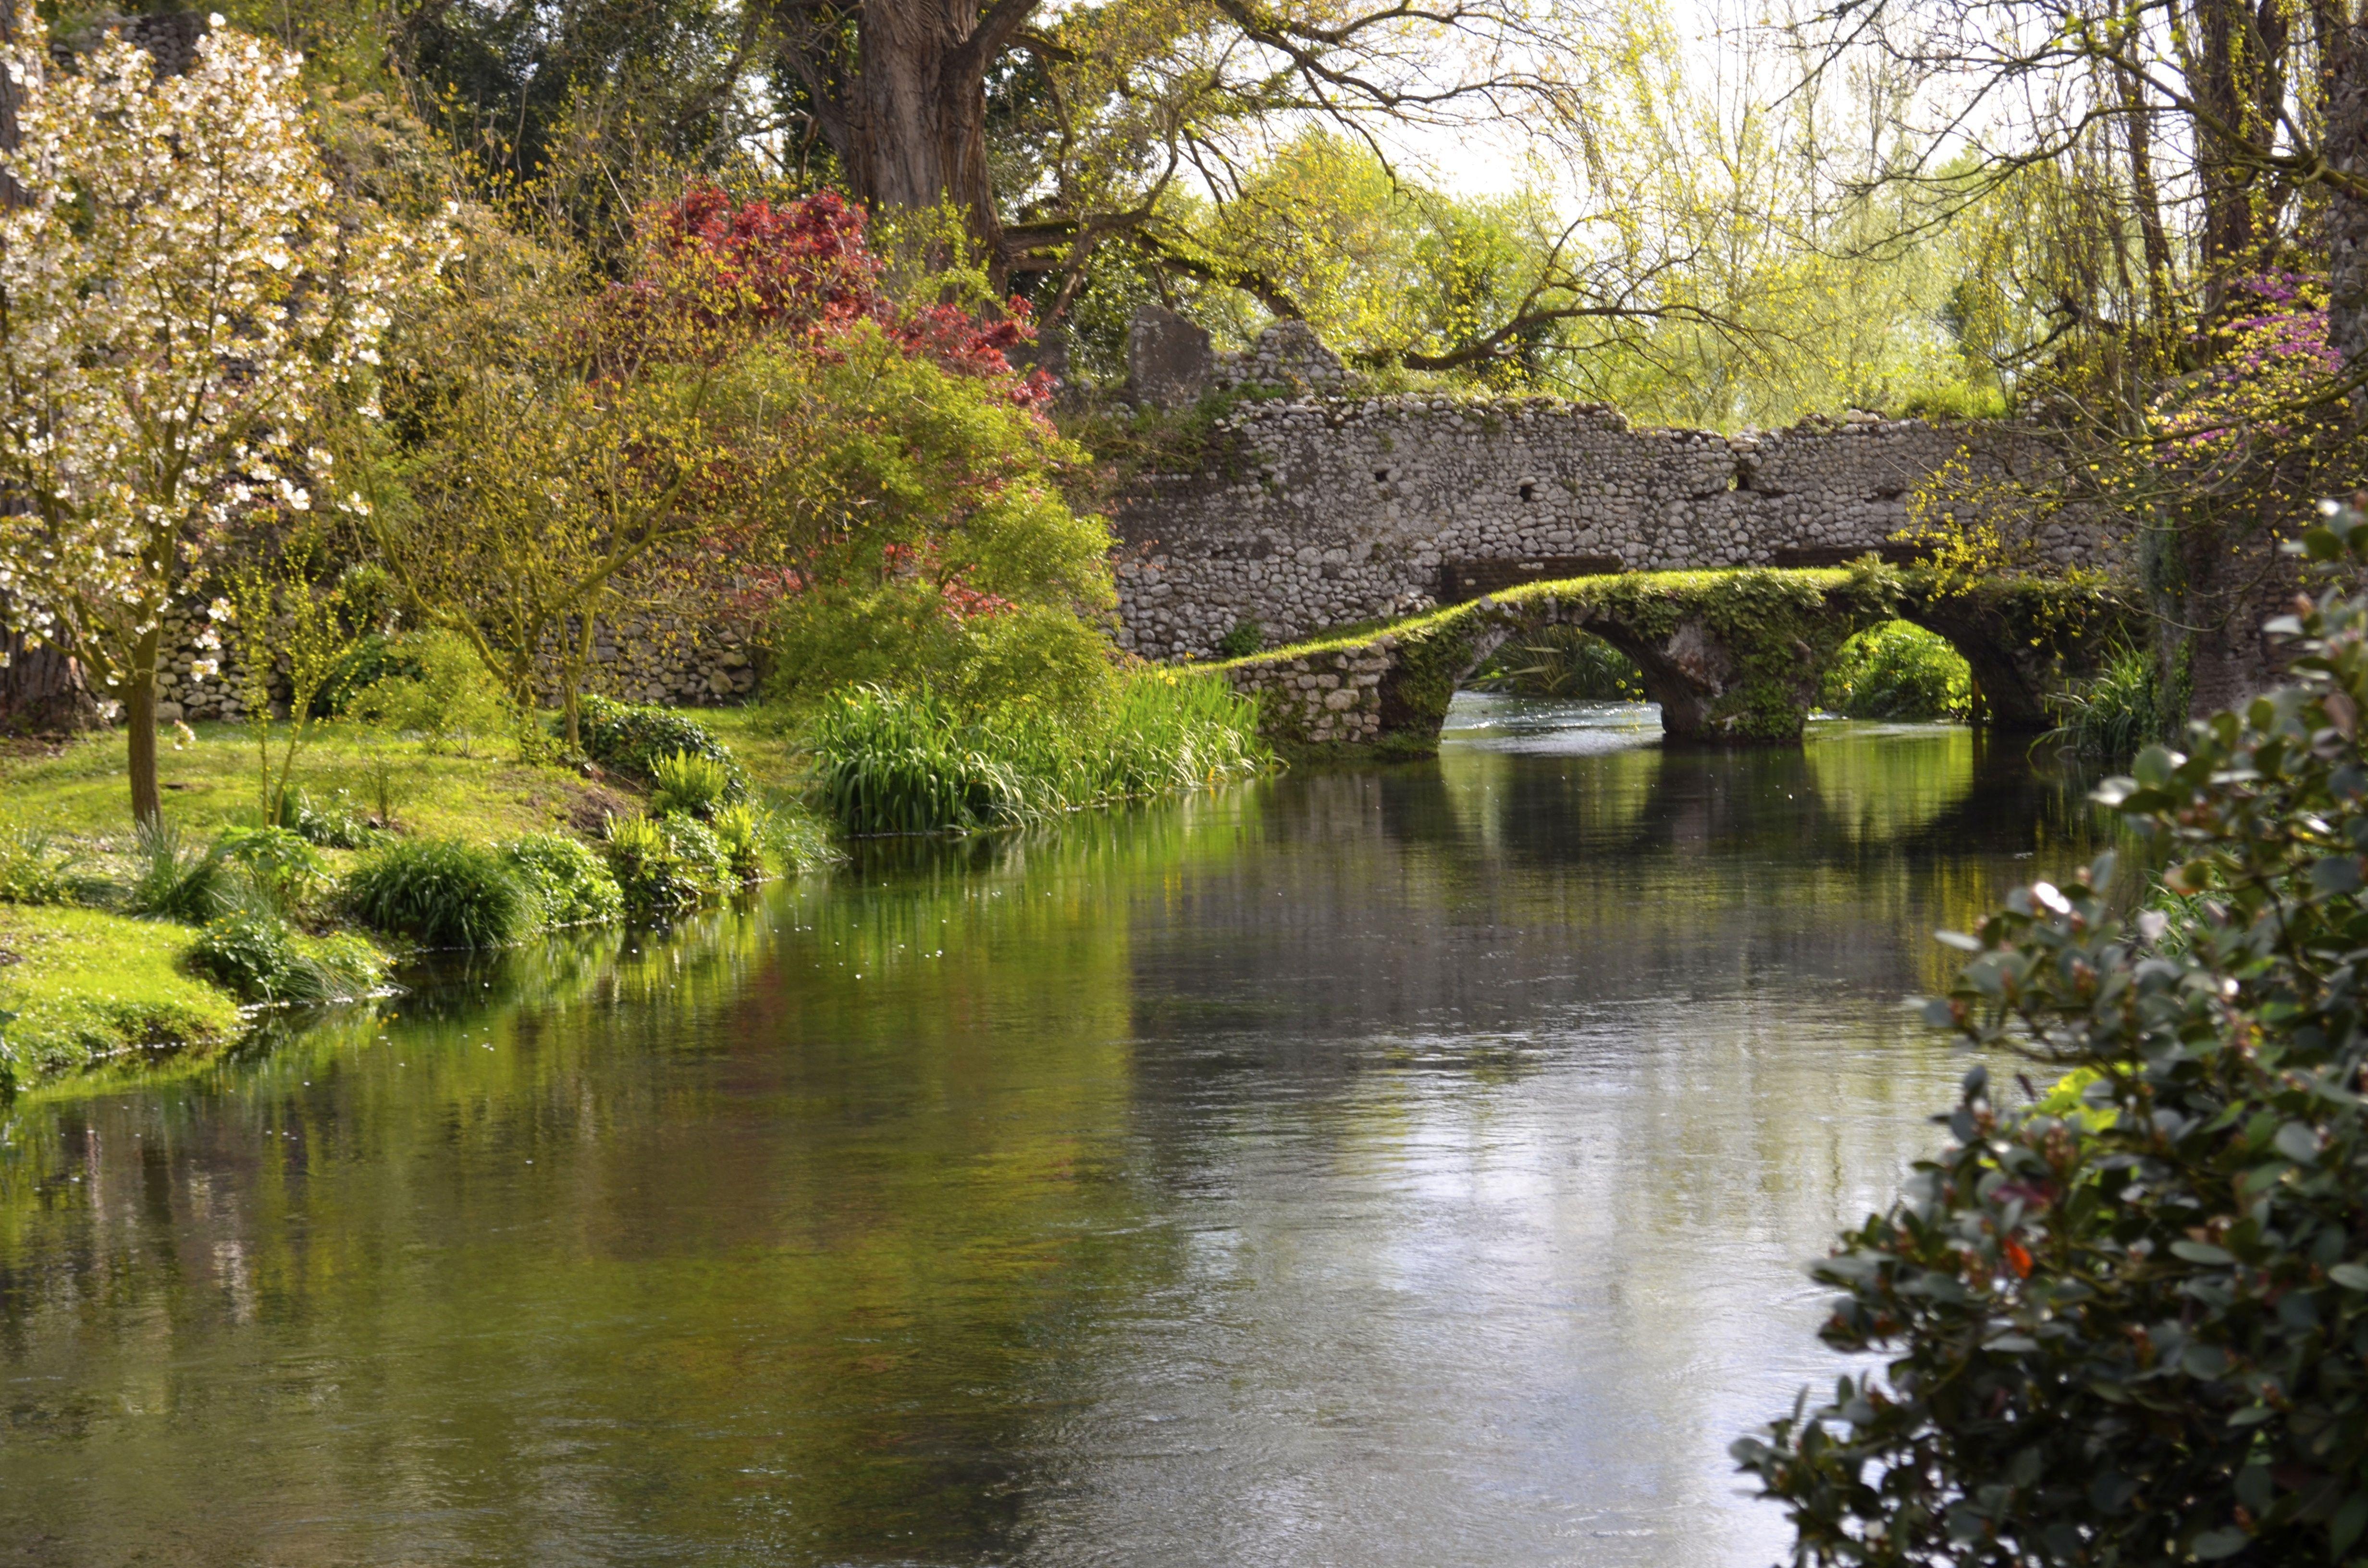 Set in a ruined medieval town, the romantic Ninfa Gardens are located in the Lazio region of Italy, 40 miles southeast of Rome #Ninfa #Castello_Caetani #Sermoneta #Latina #Lazio #Italy